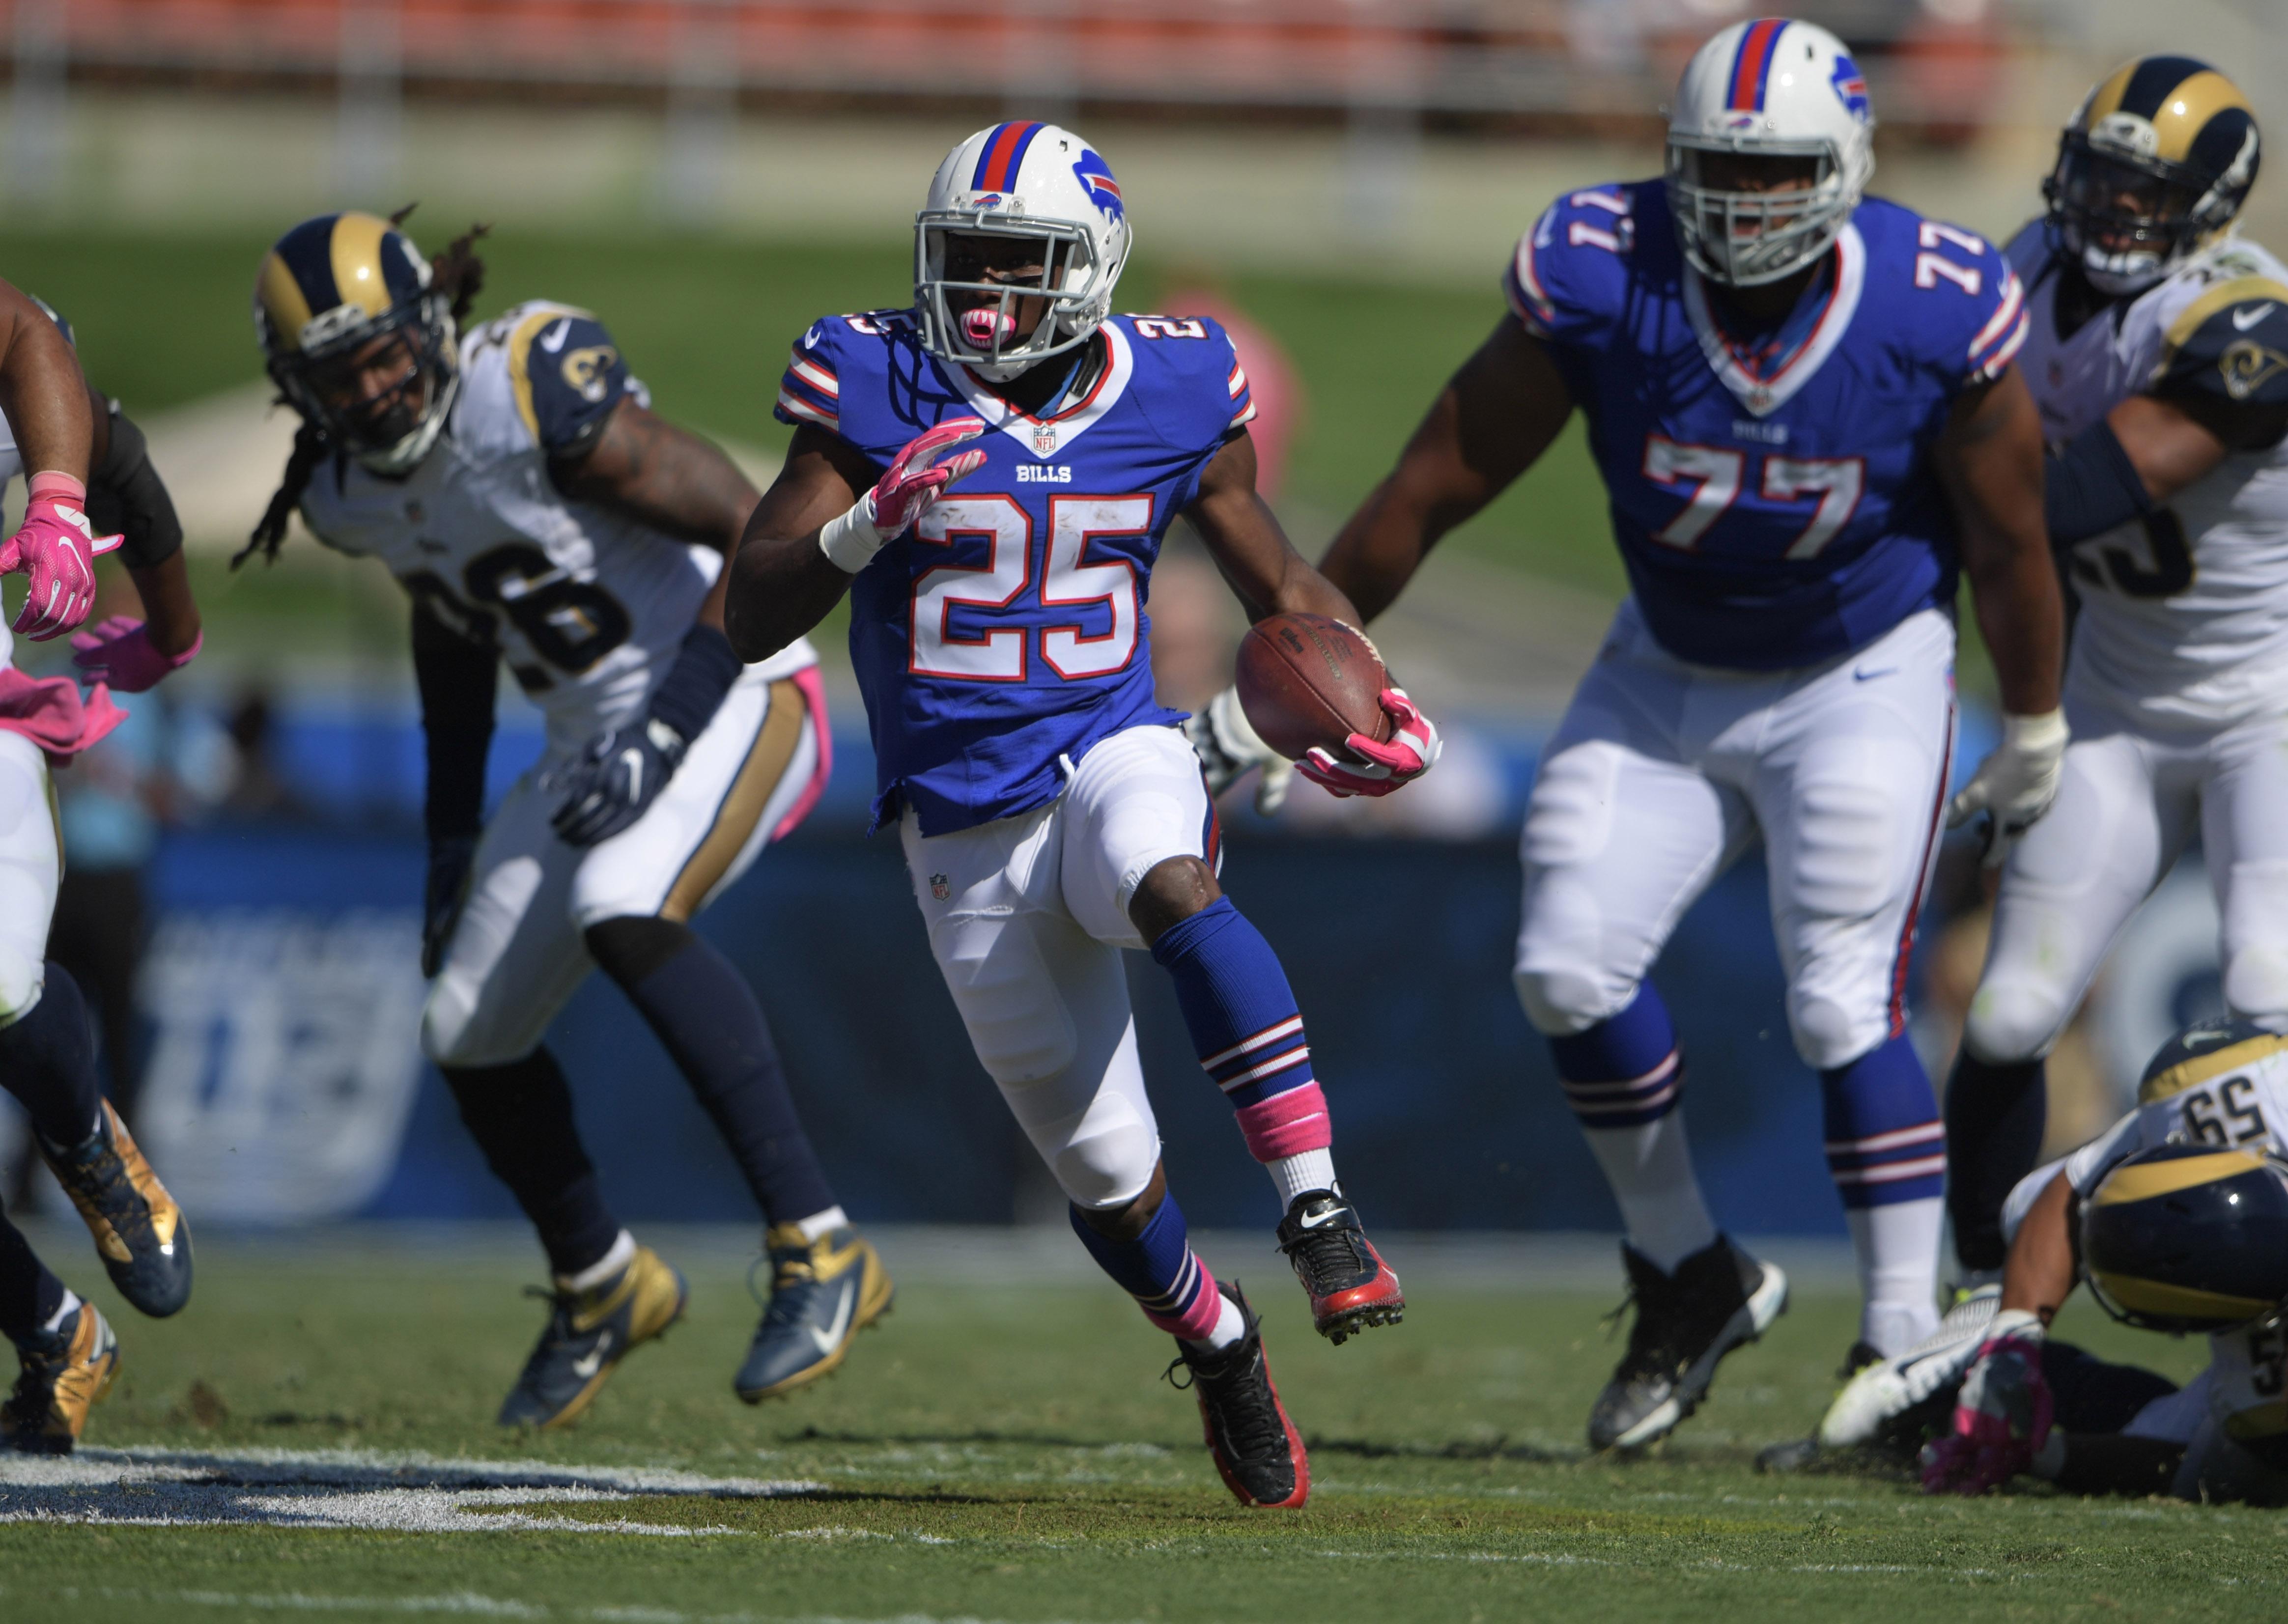 NFL: Buffalo Bills at Los Angeles Rams